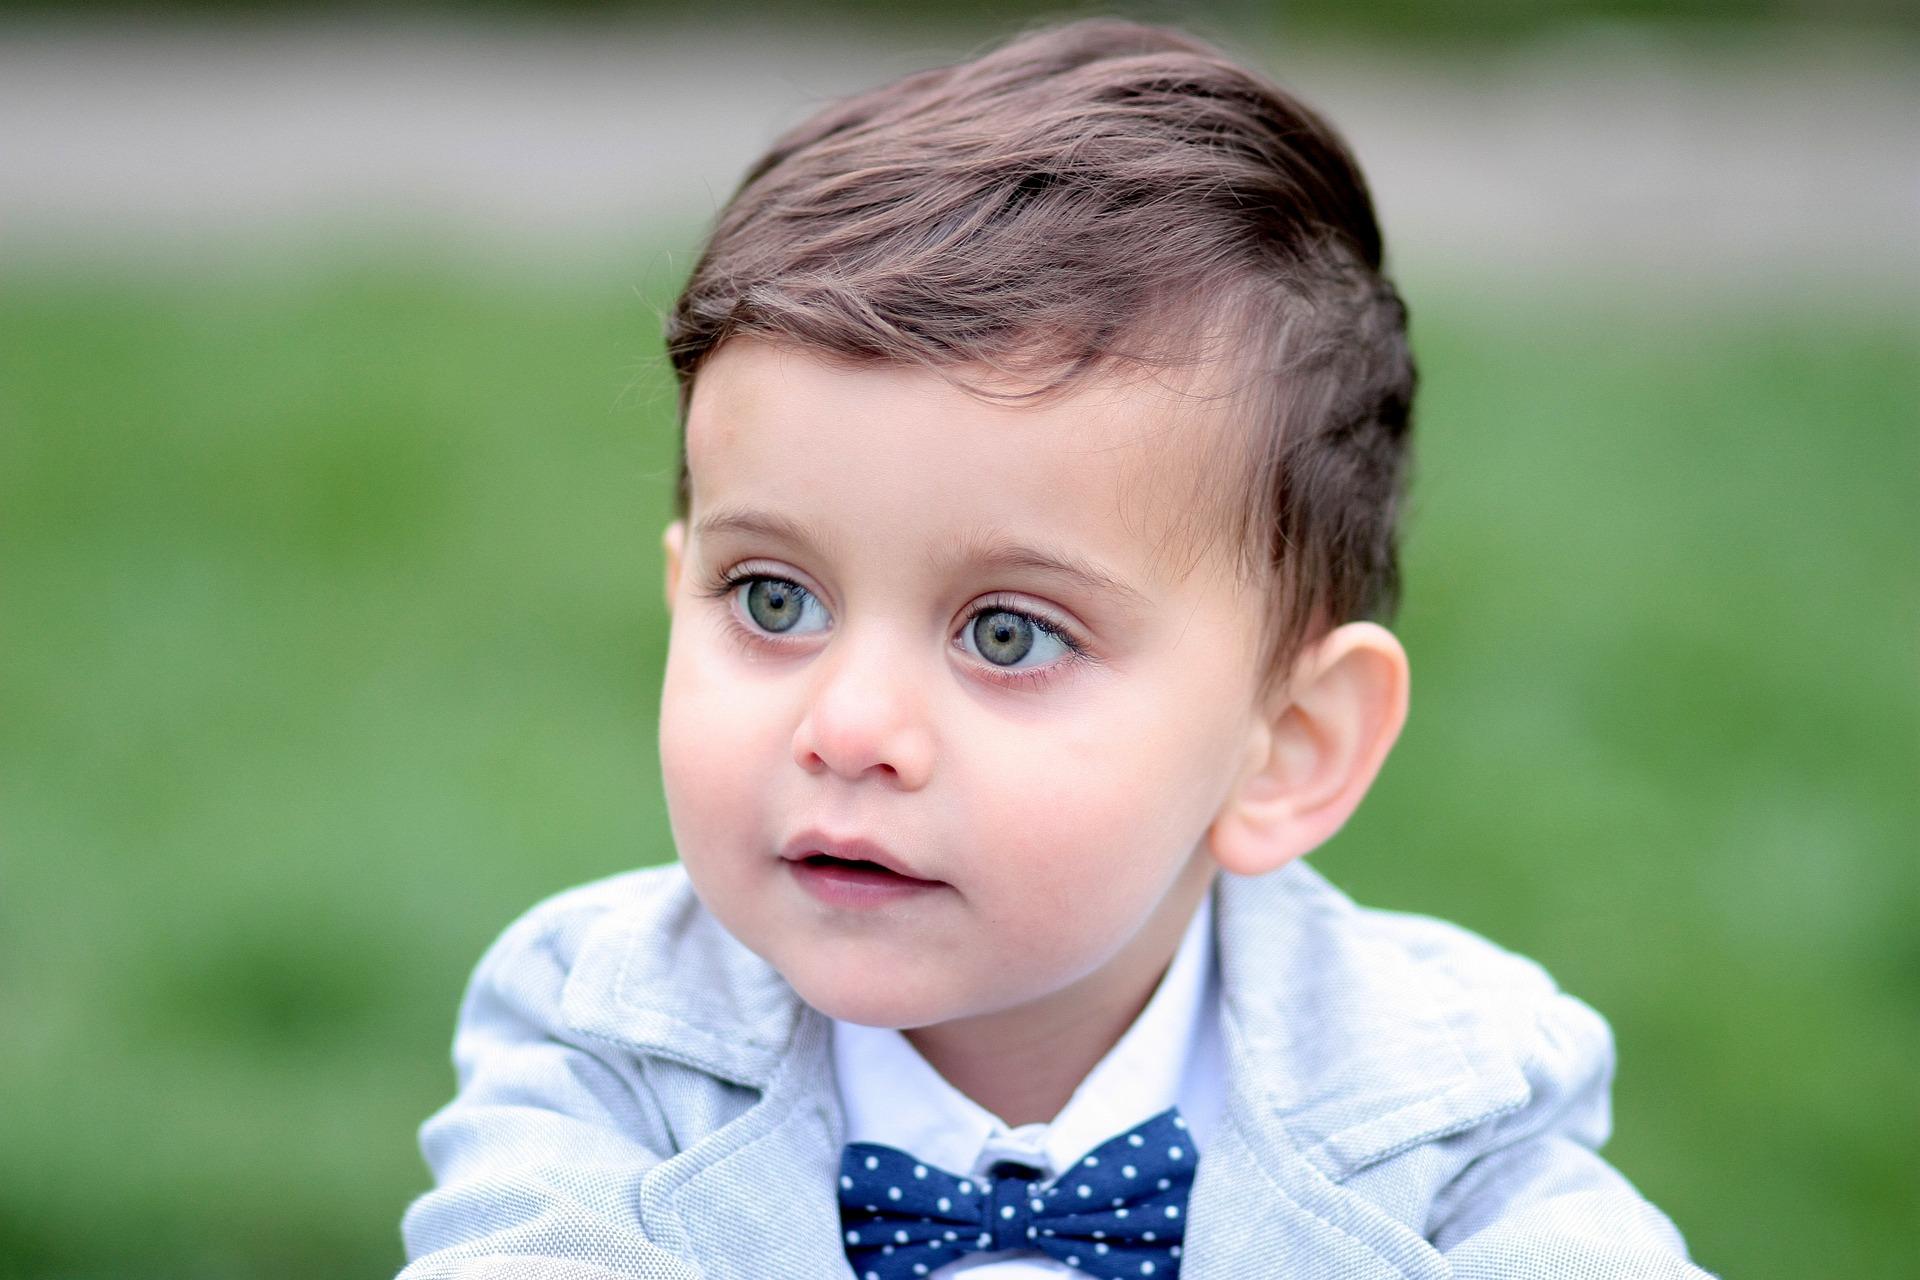 Cele mai intalnite afectiuni oculare la copii